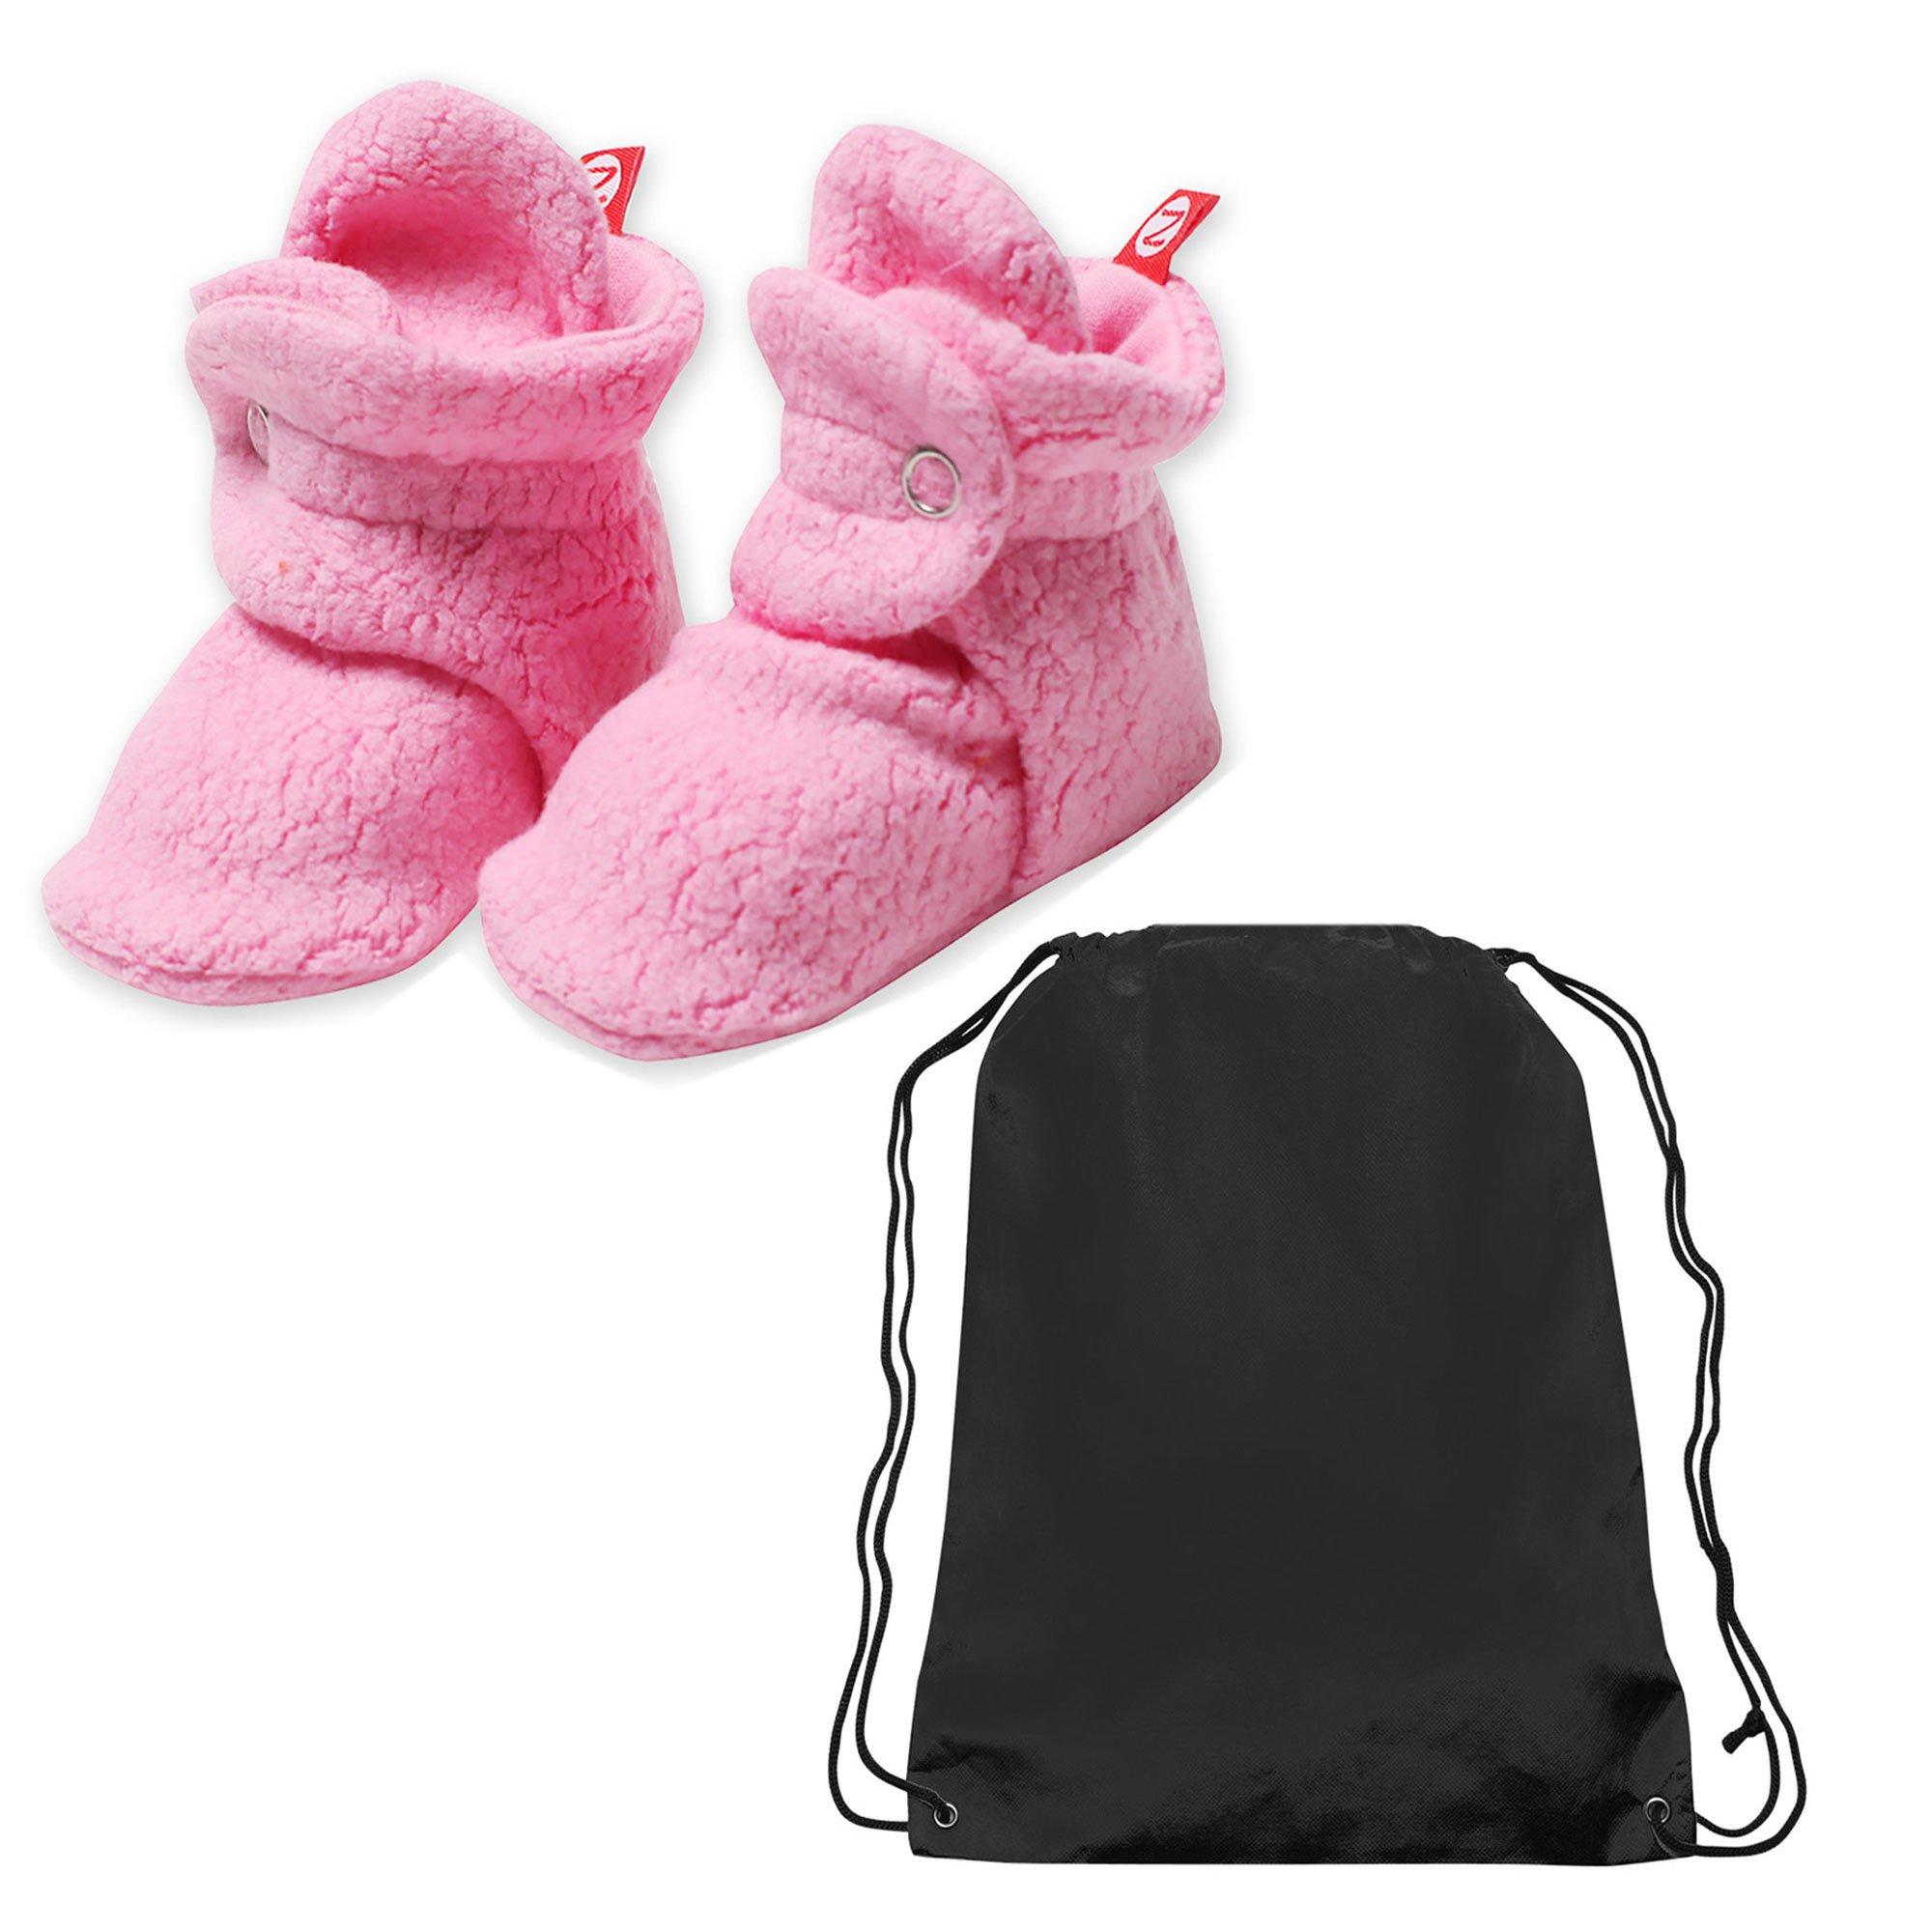 Zutano Booties Baby Girls Fleece Slipper Socks and Toy Bag - Hot Pink - 3 Months